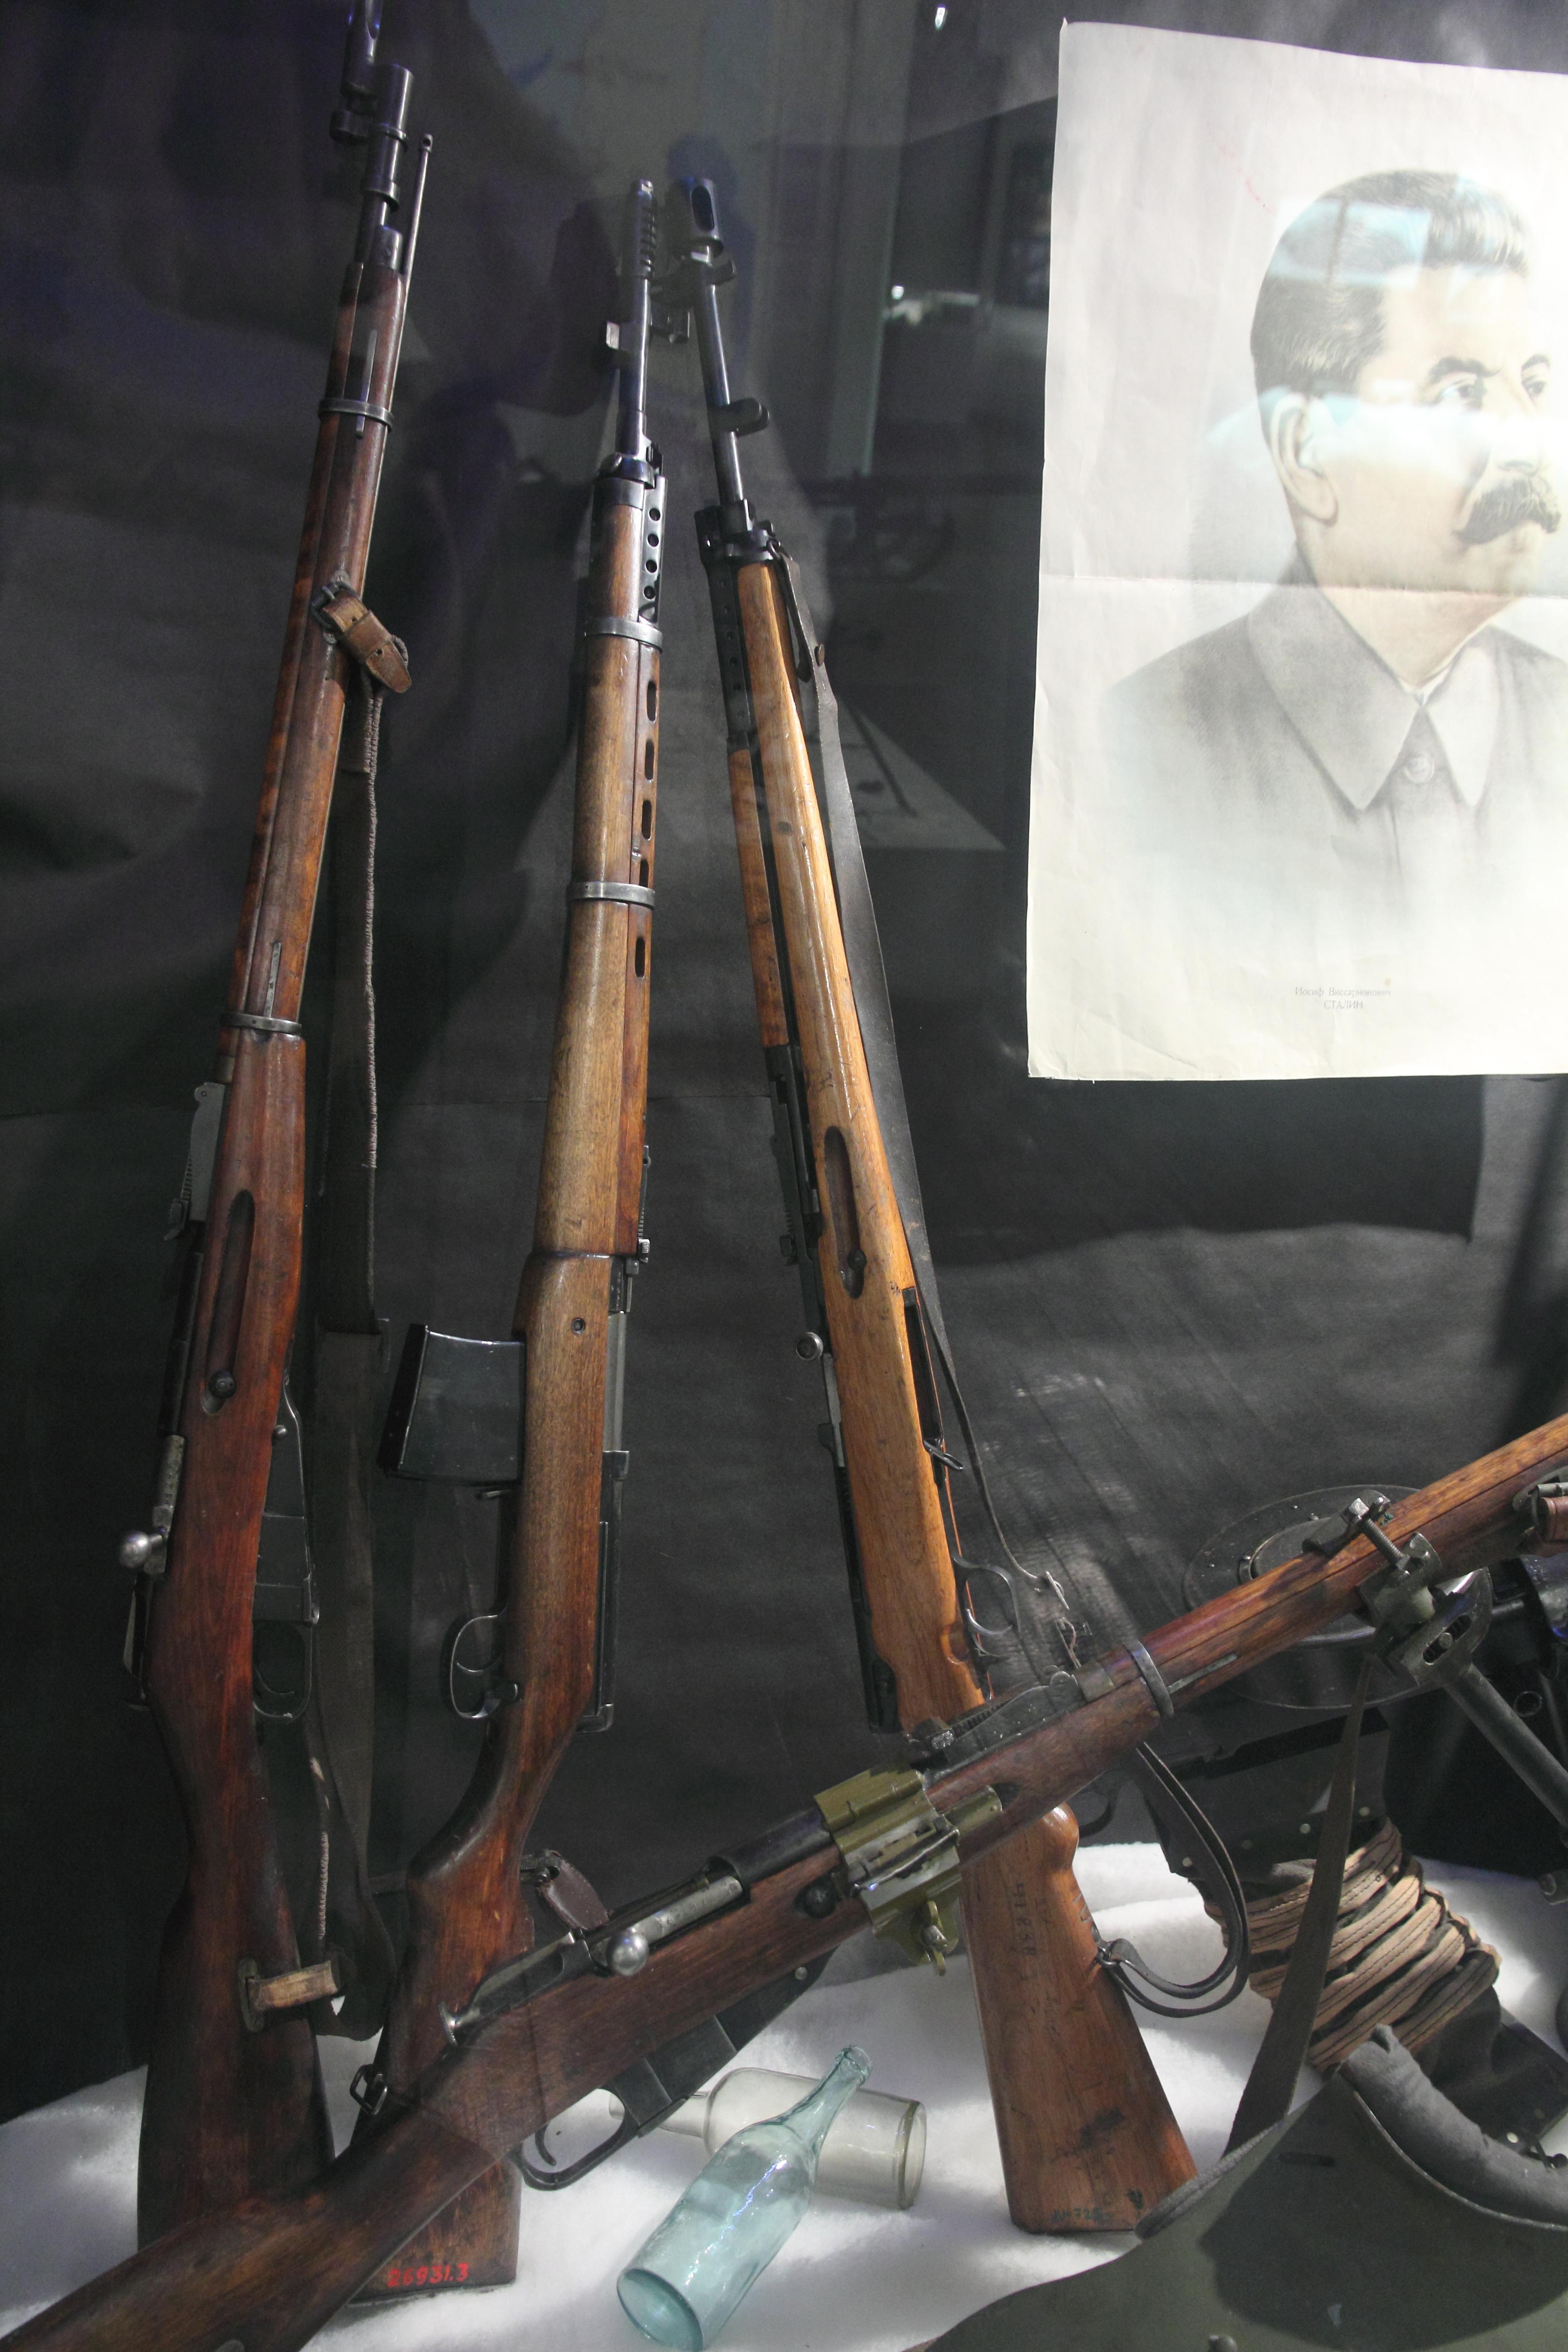 FileSoviet World War 2 RiflesJPG